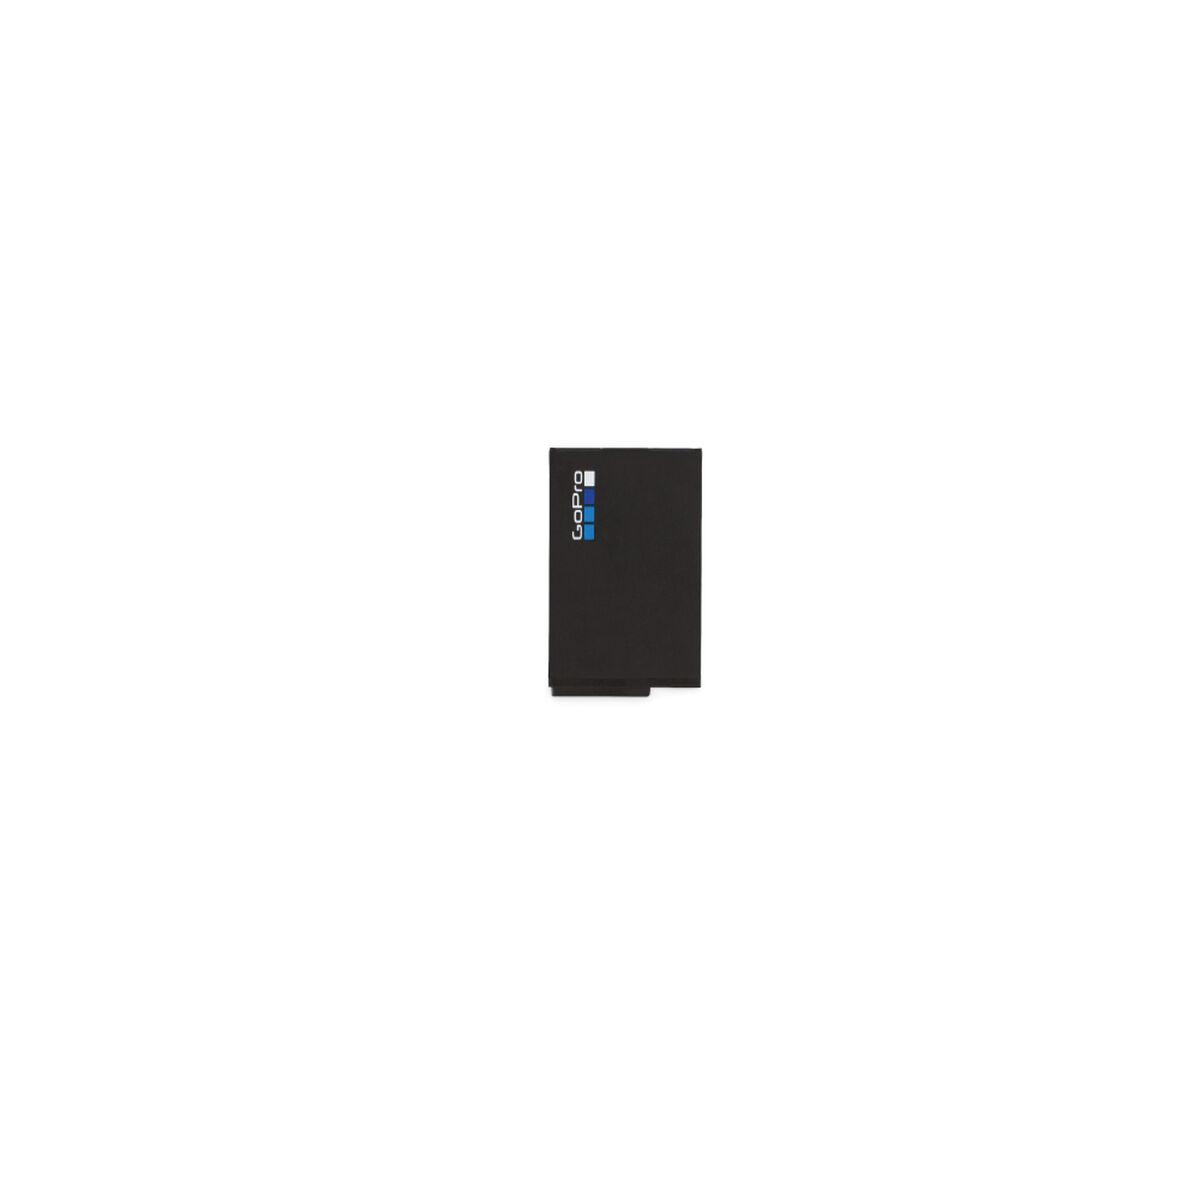 Batería para GoPro Fusion